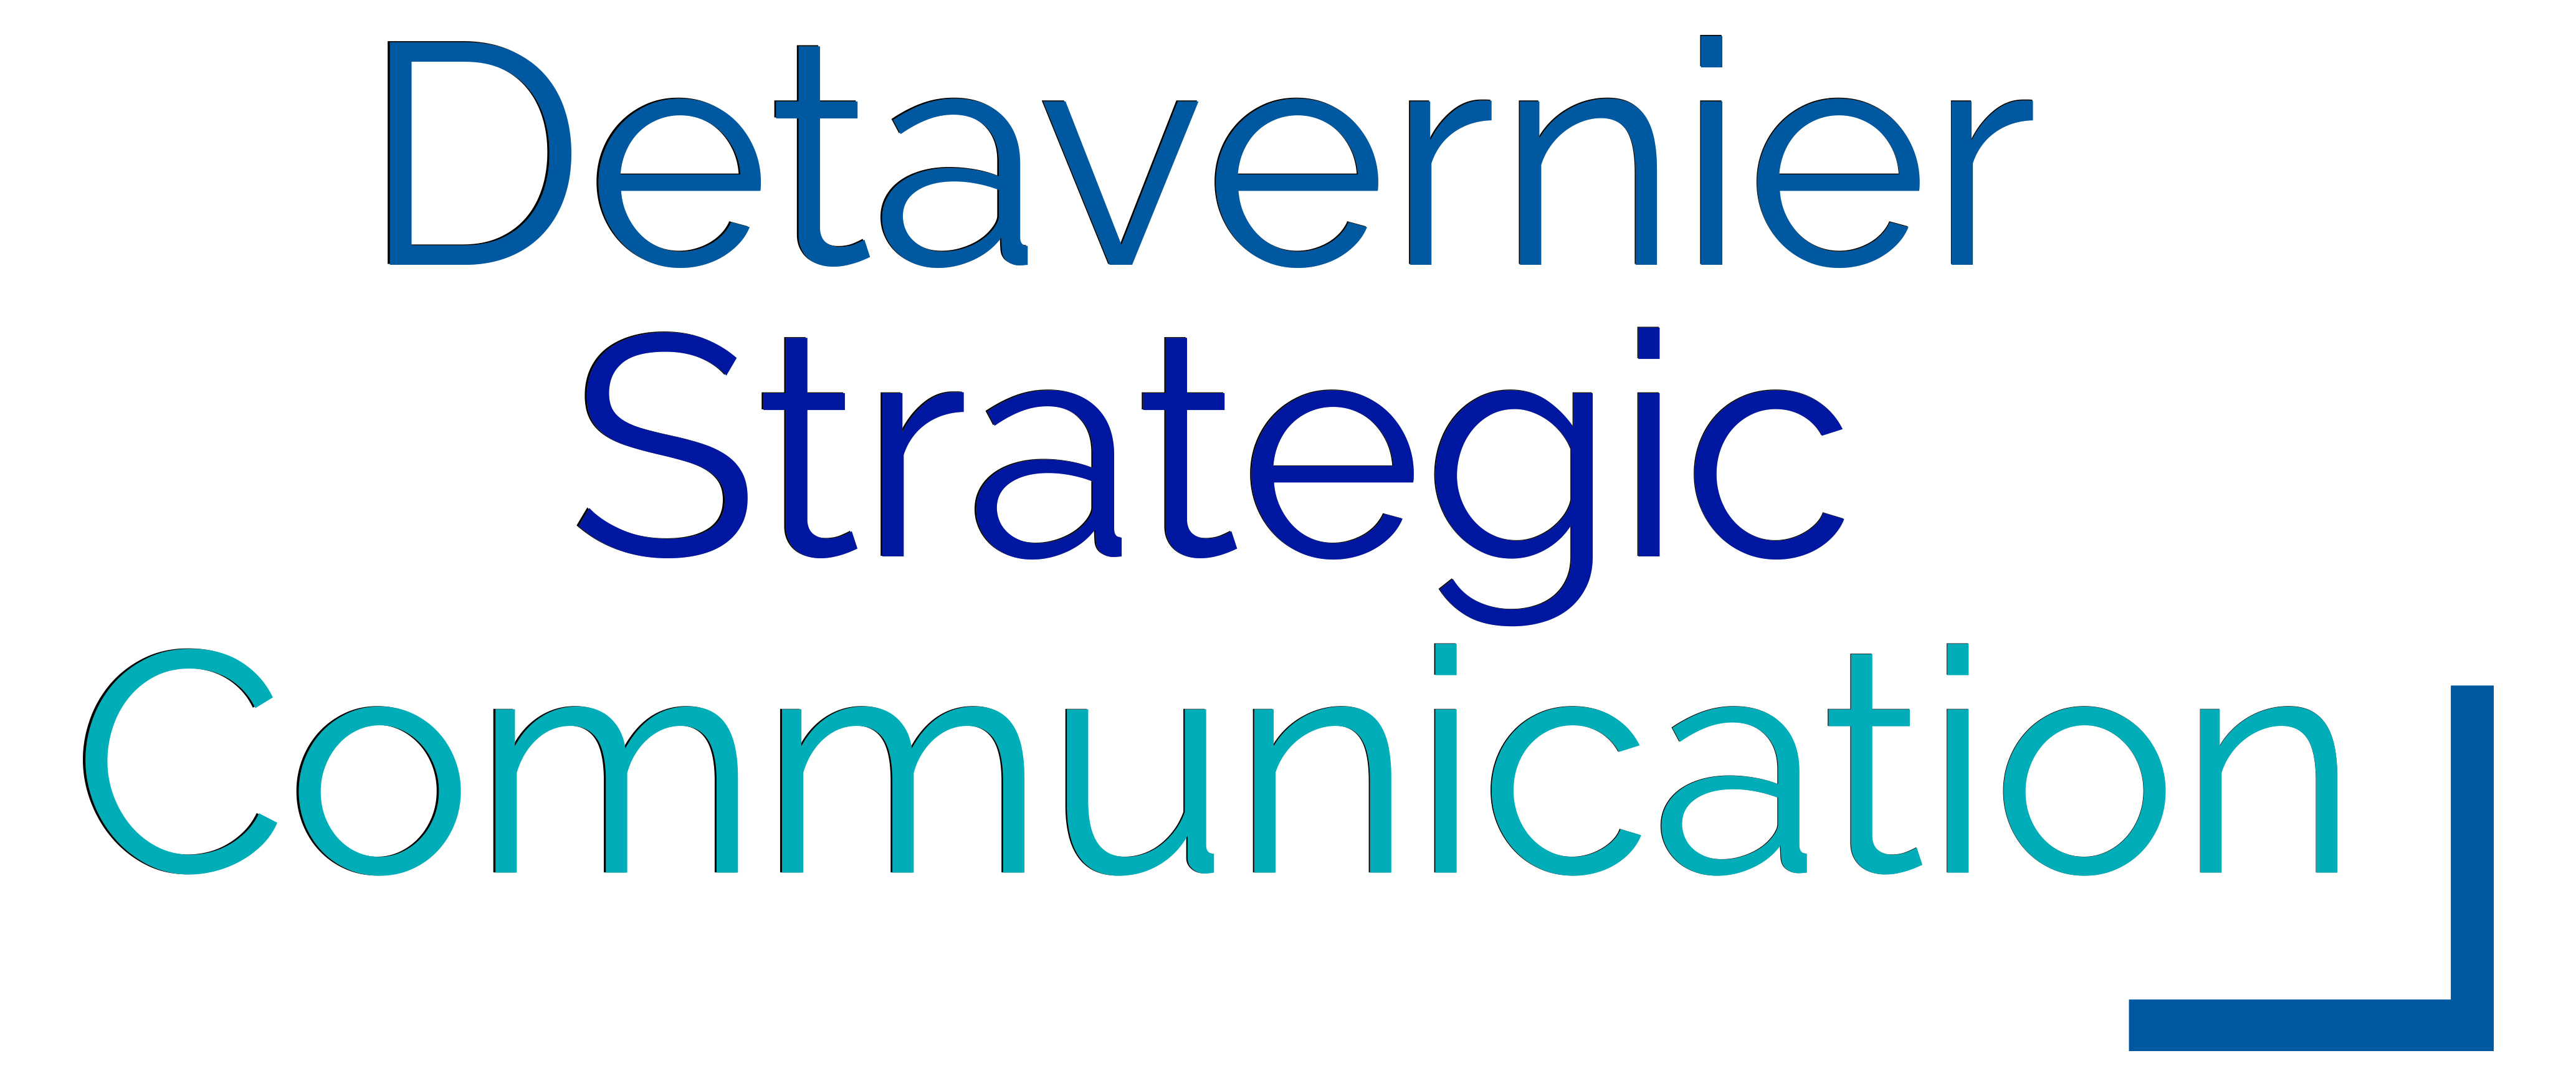 Detavernier Strategic Communication